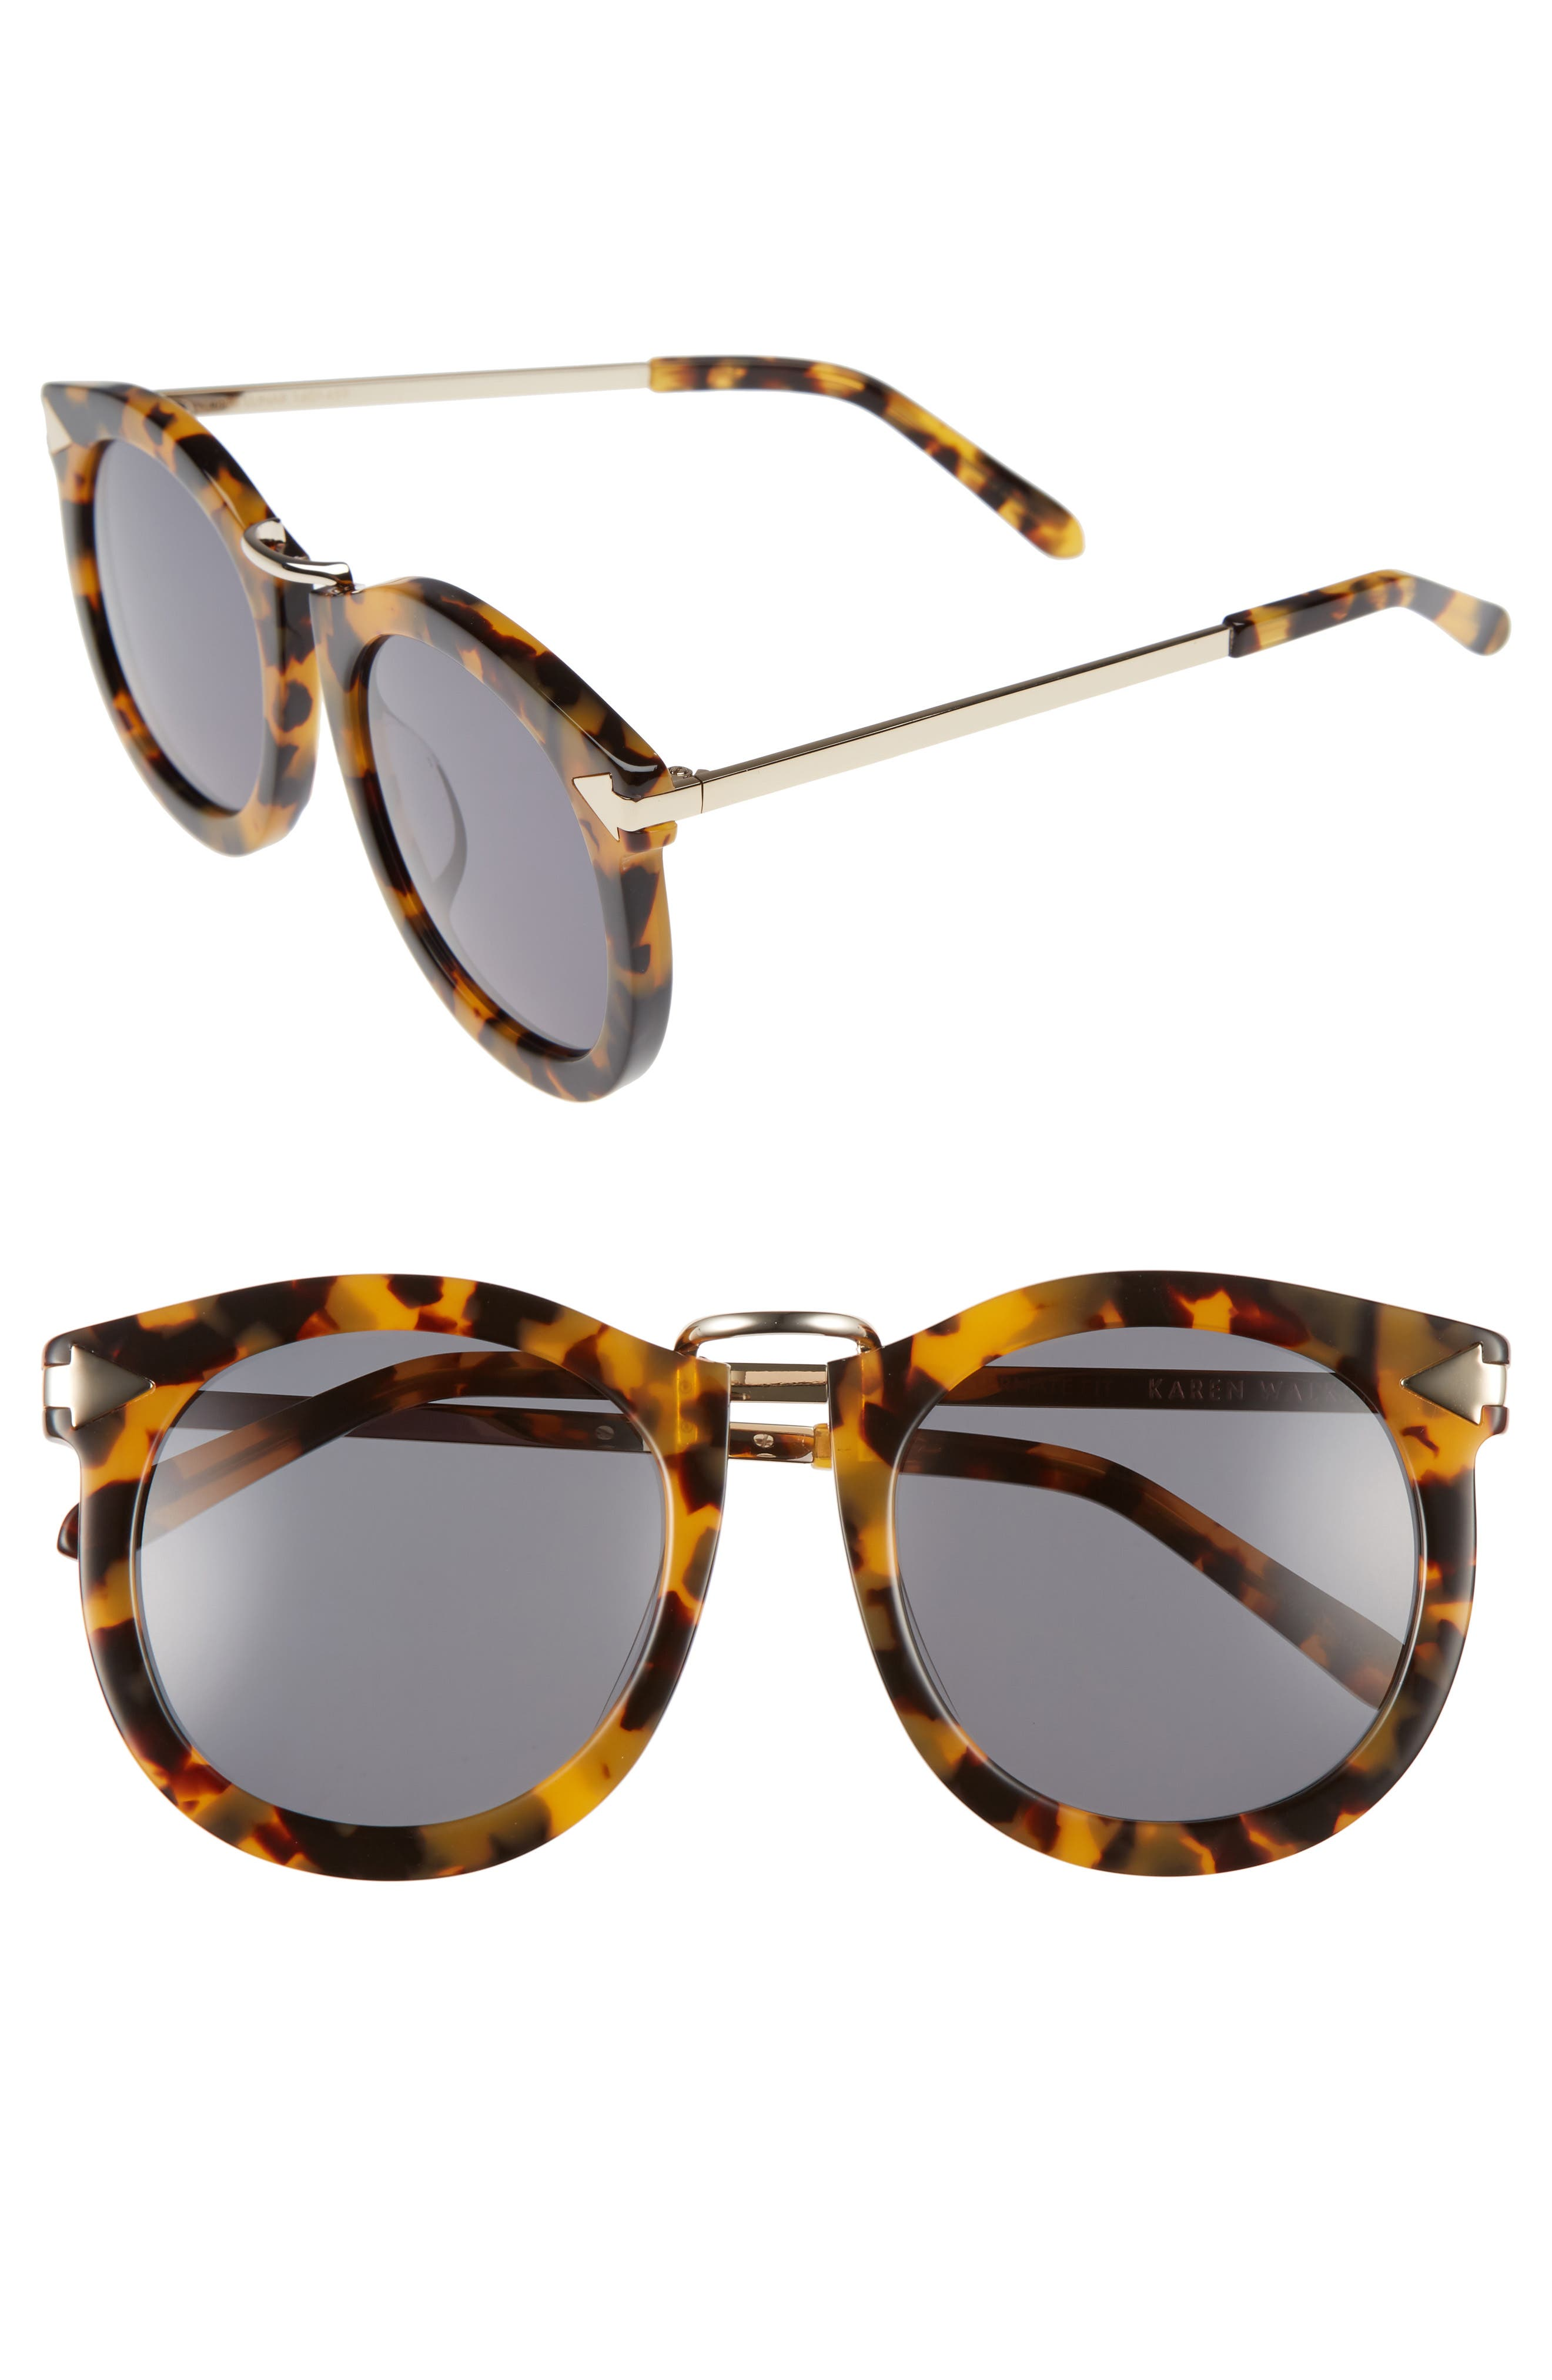 Alternative Fit Super Lunar - Arrowed by Karen 50mm Sunglasses,                             Alternate thumbnail 4, color,